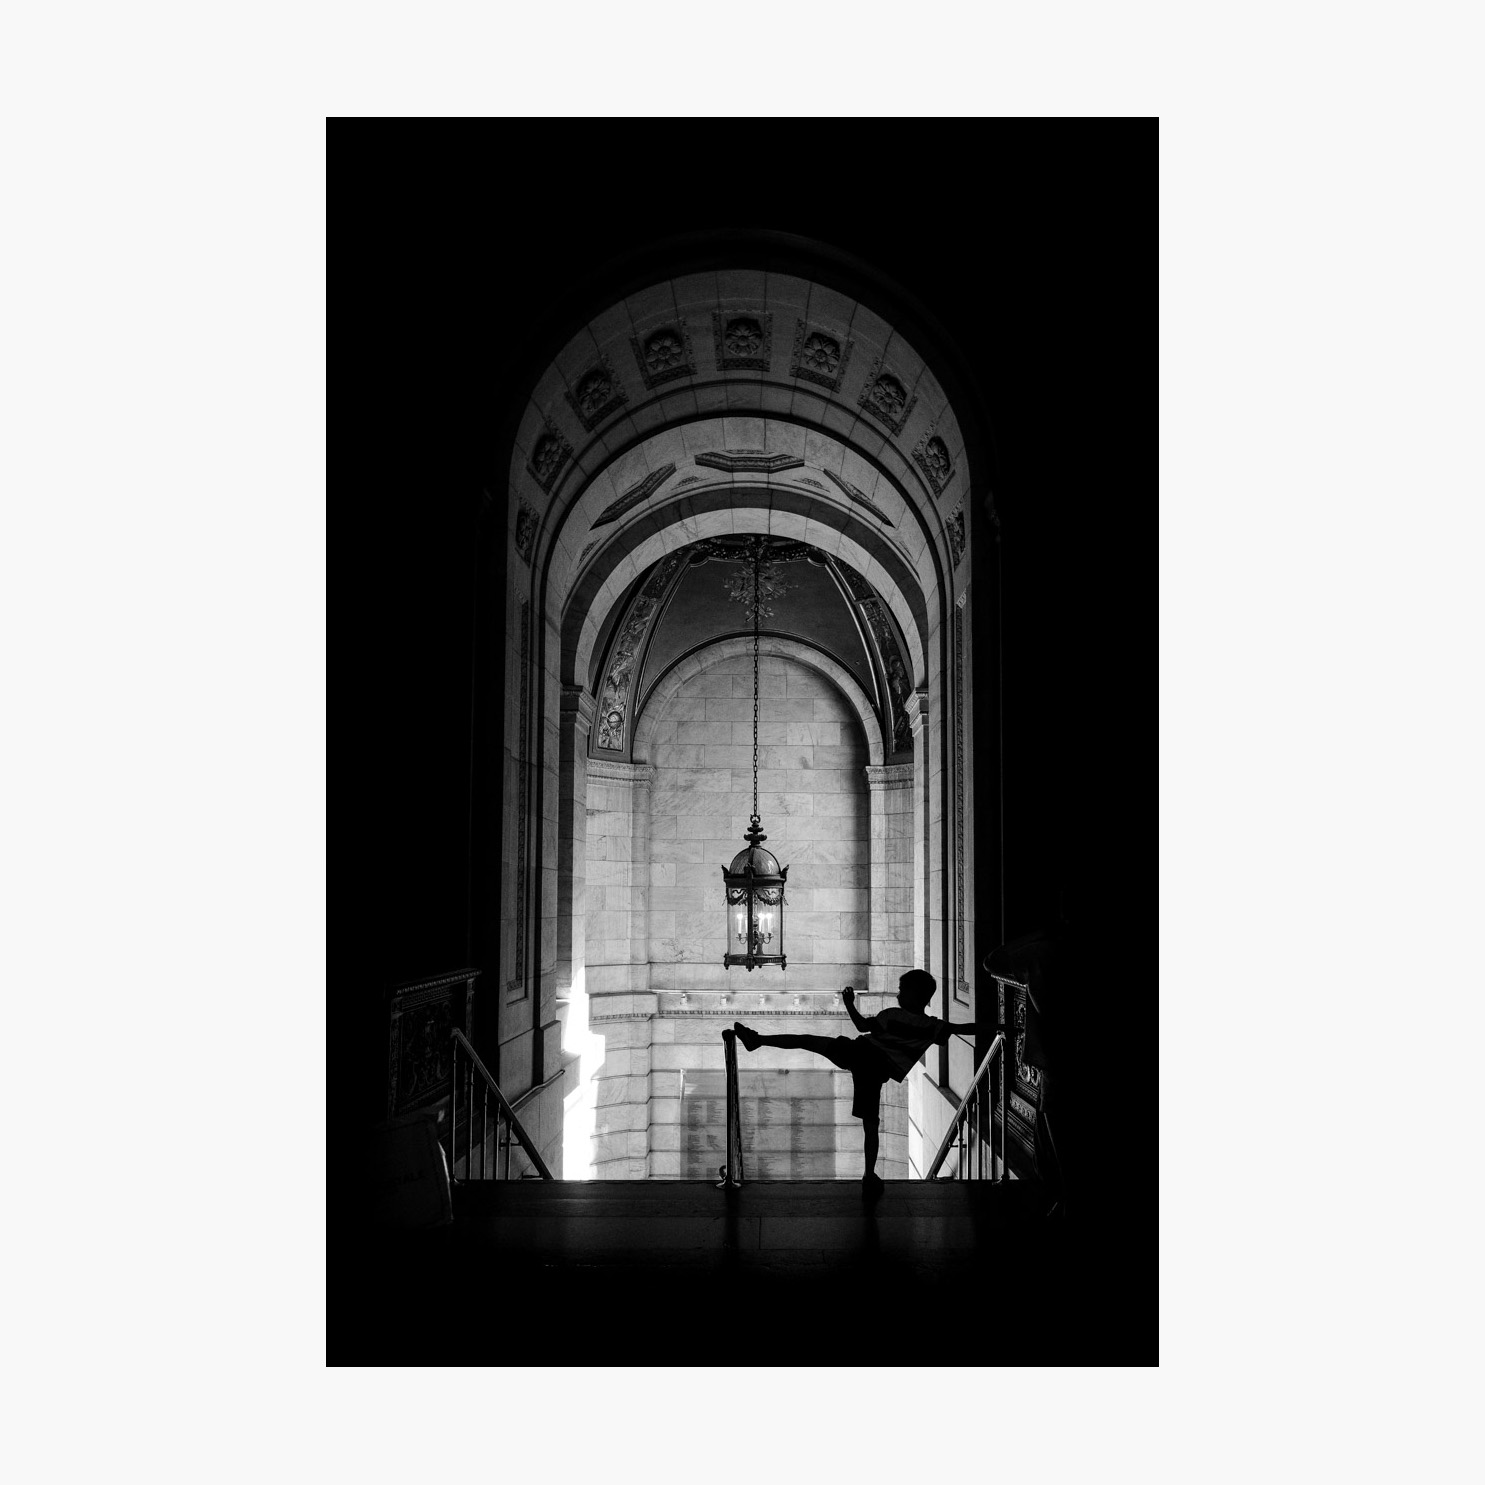 ©-2018-Harry-W-Edmonds-London-Photographer-Photographers-Note-Making-the-Shot-PN02.jpg